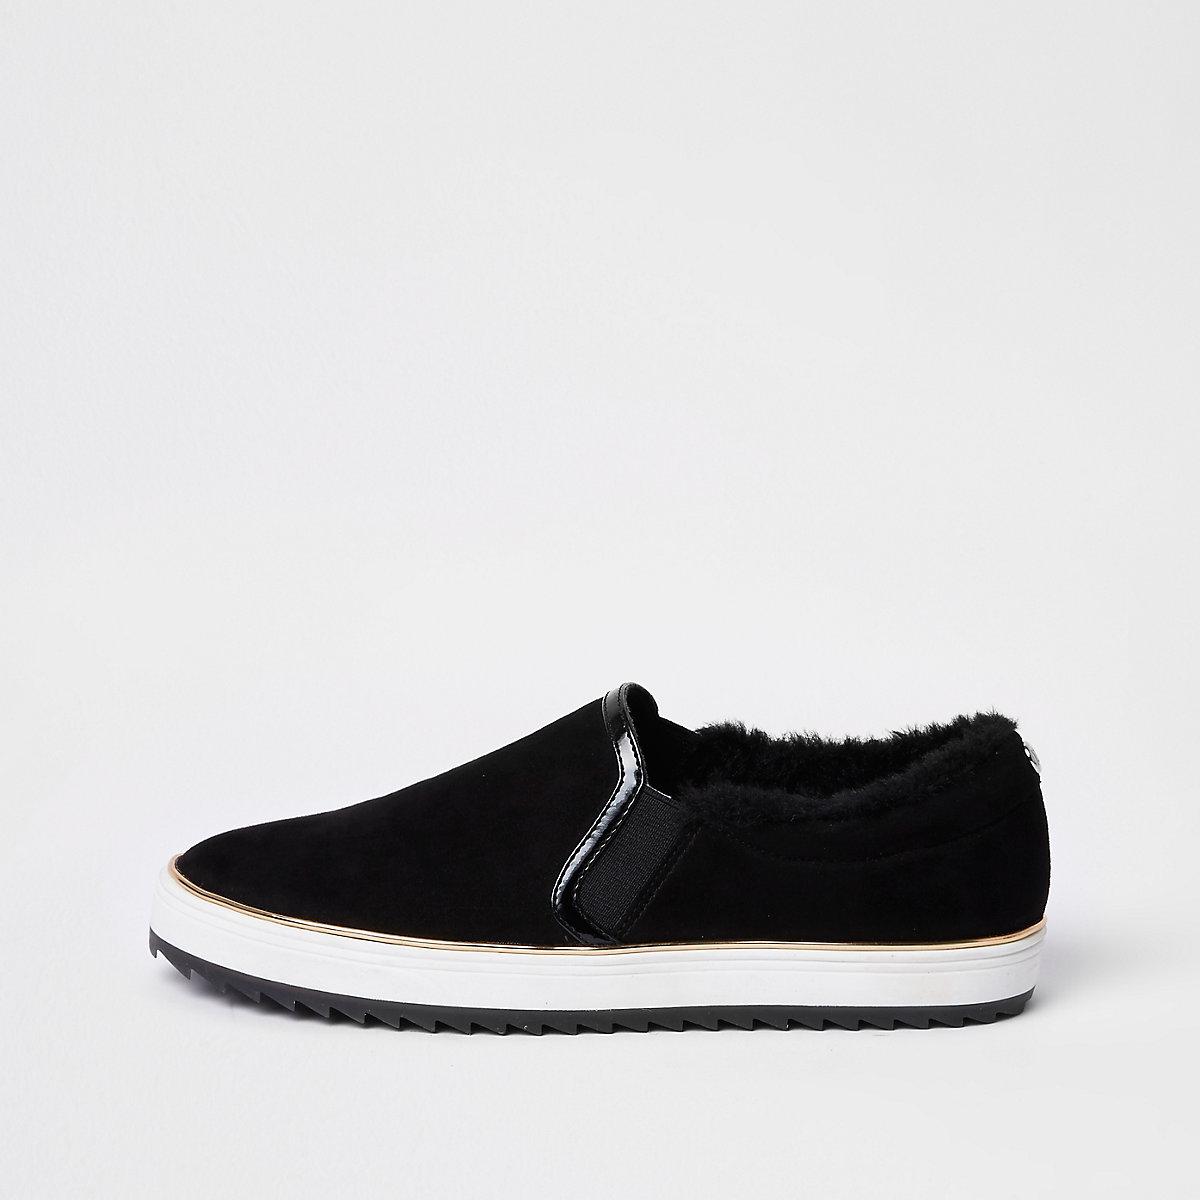 Black faux fur lined slip on plimsolls